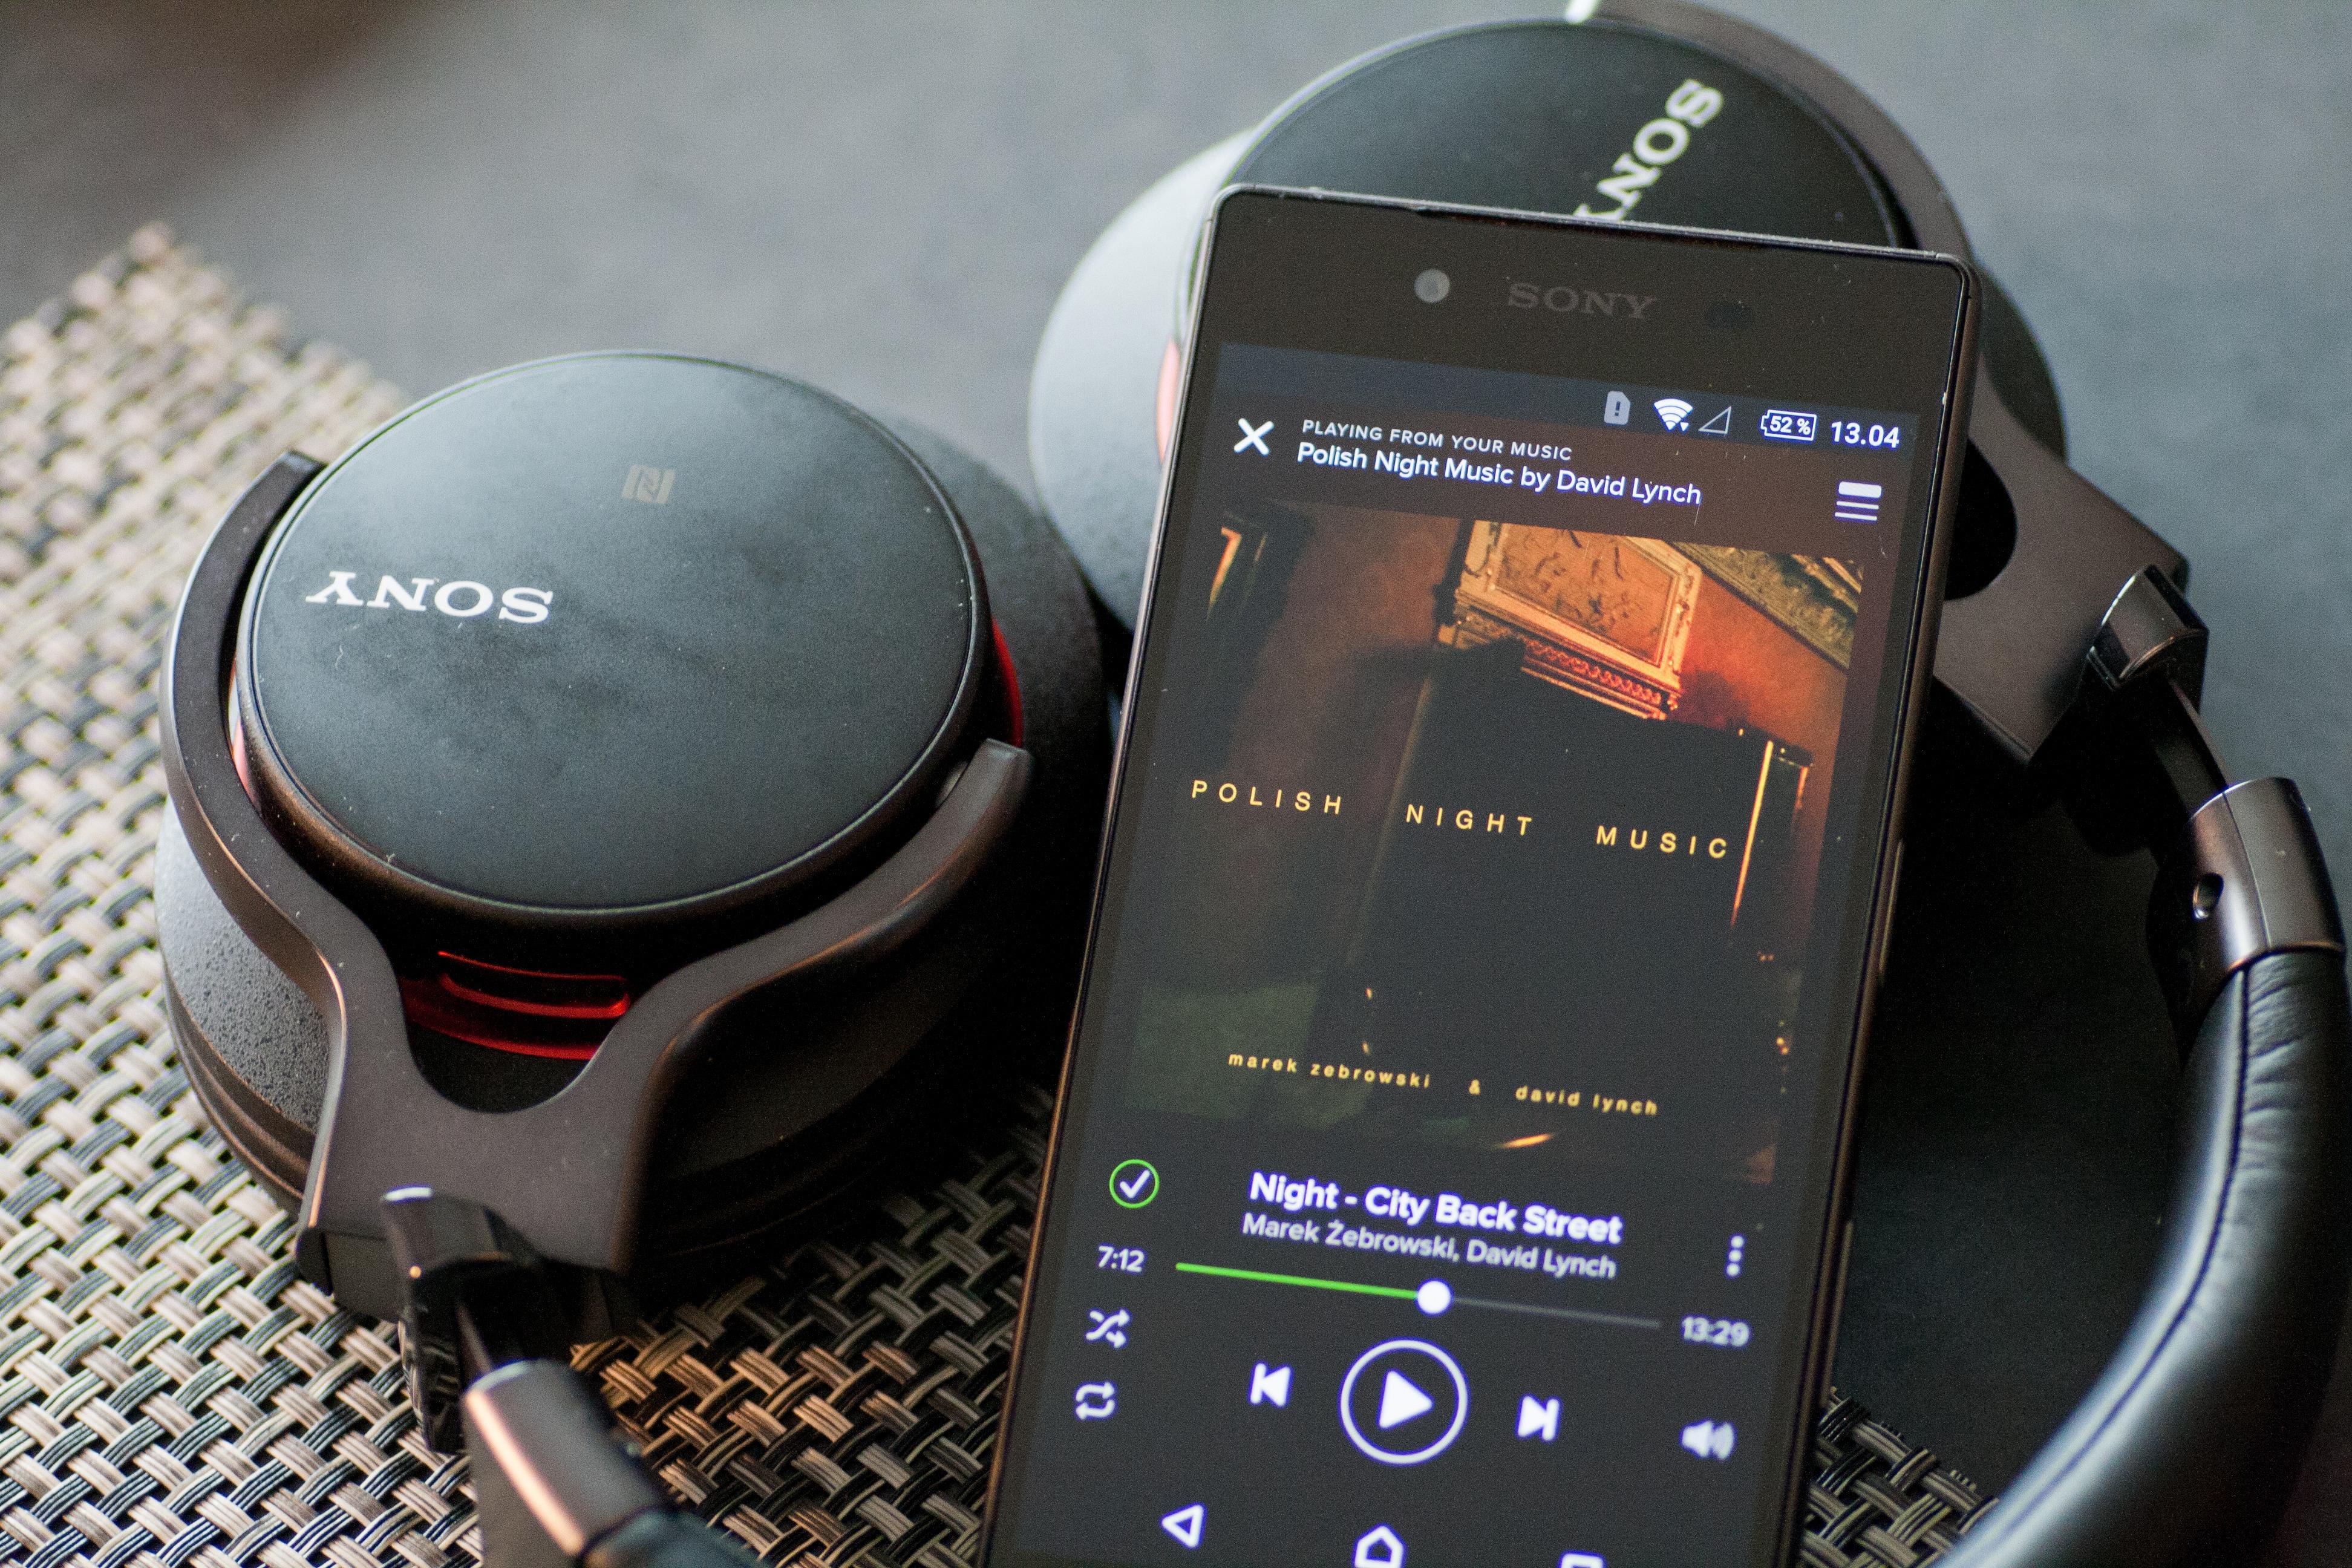 Sonys blåtannklokker låter veldig bra også når du strømmer musikken til dem fra tjenester som Spotify. Foto: Anders Brattensborg Smedsrud, Tek.no